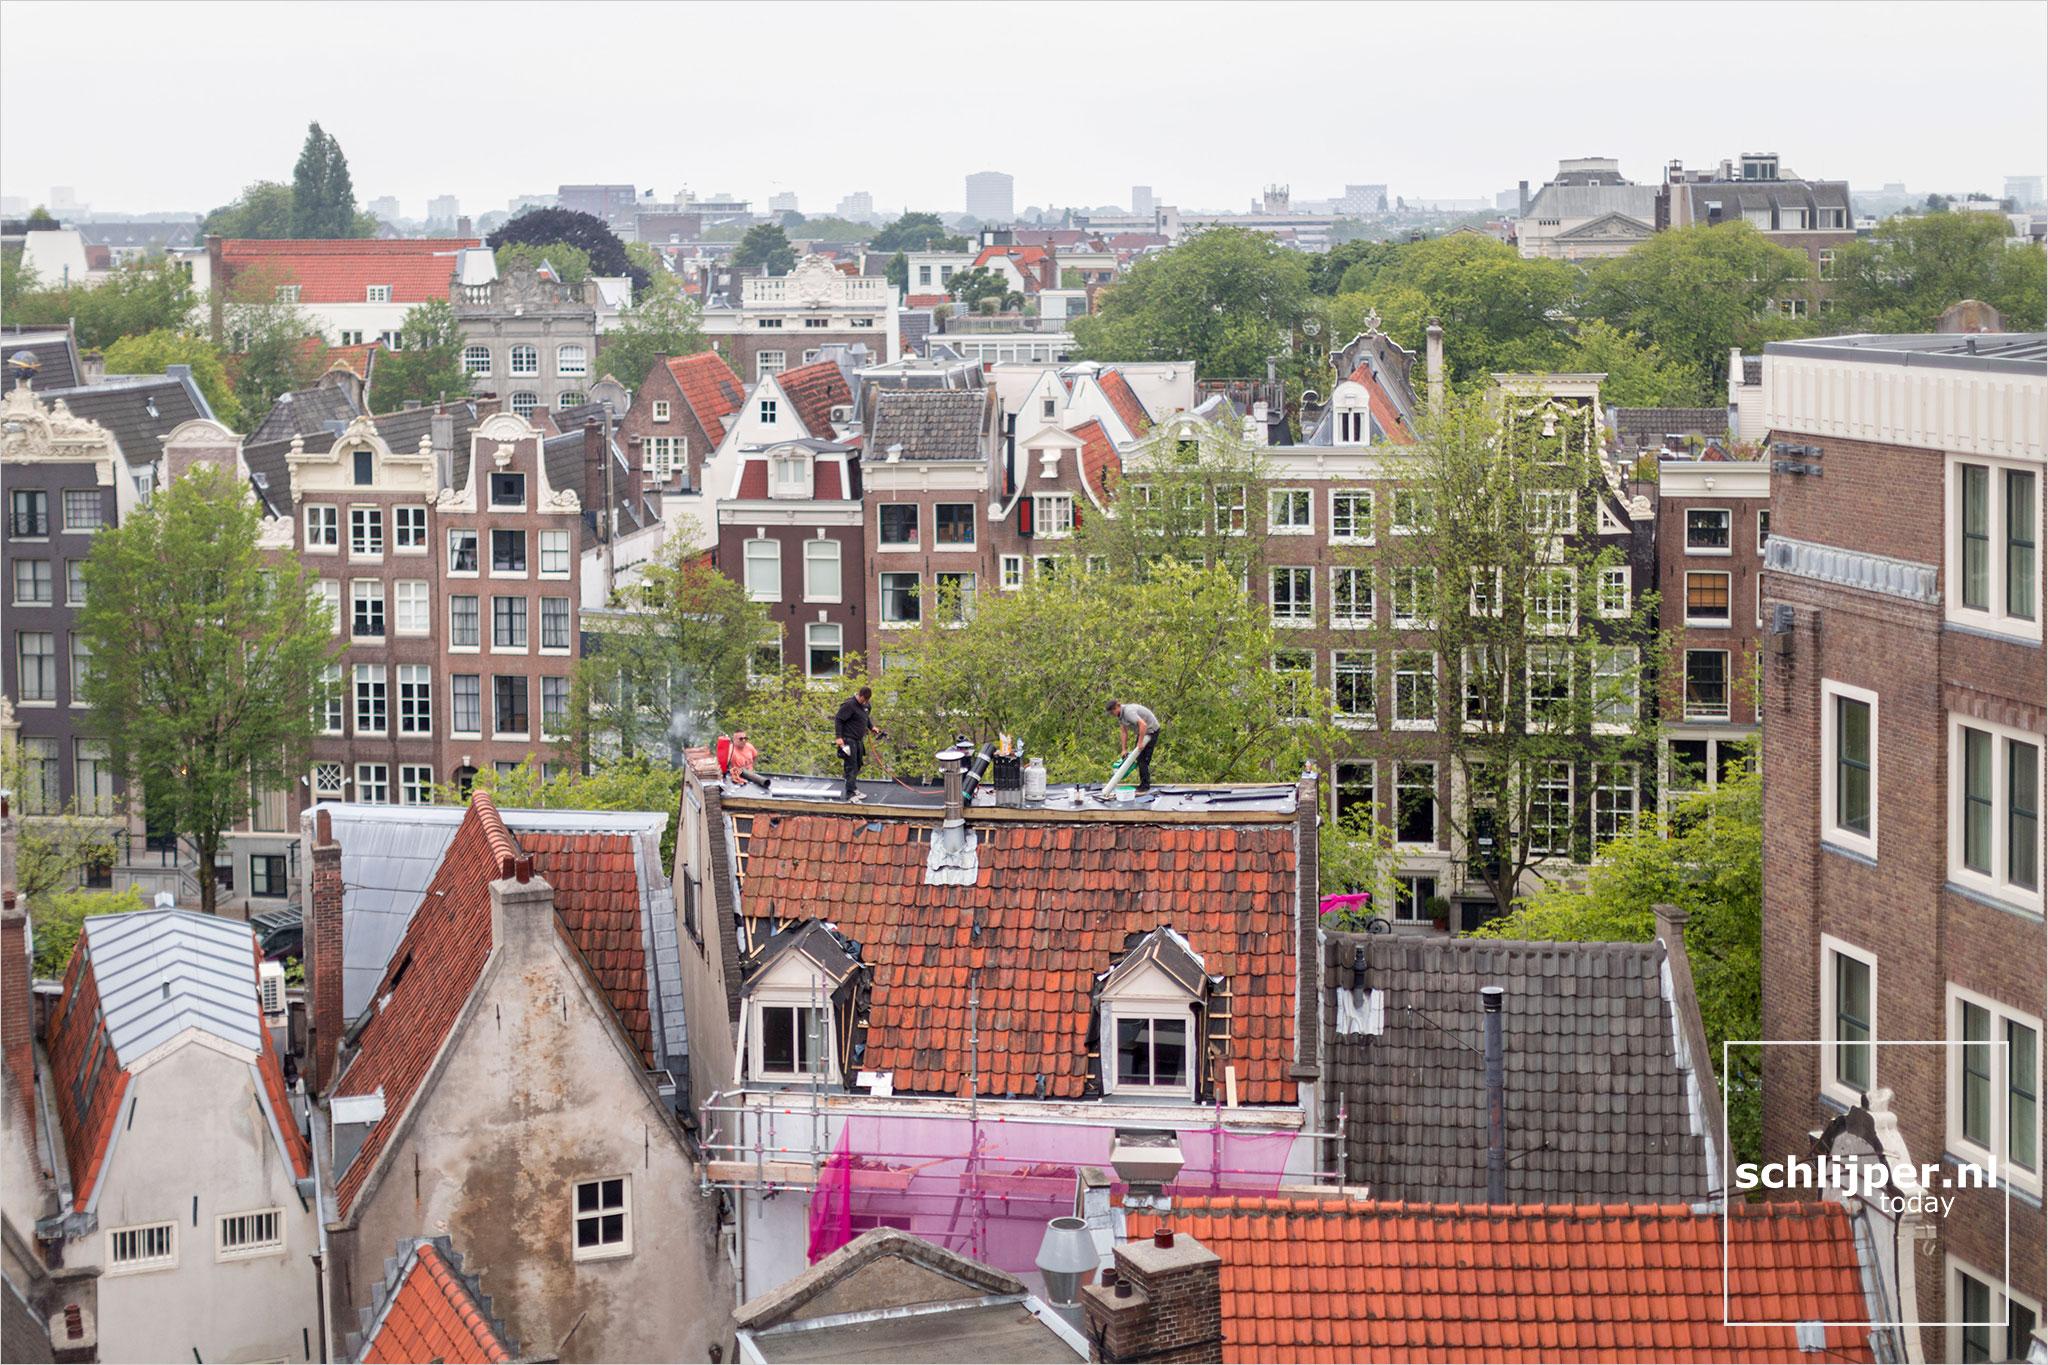 The Netherlands, Amsterdam, 13 juli 2021